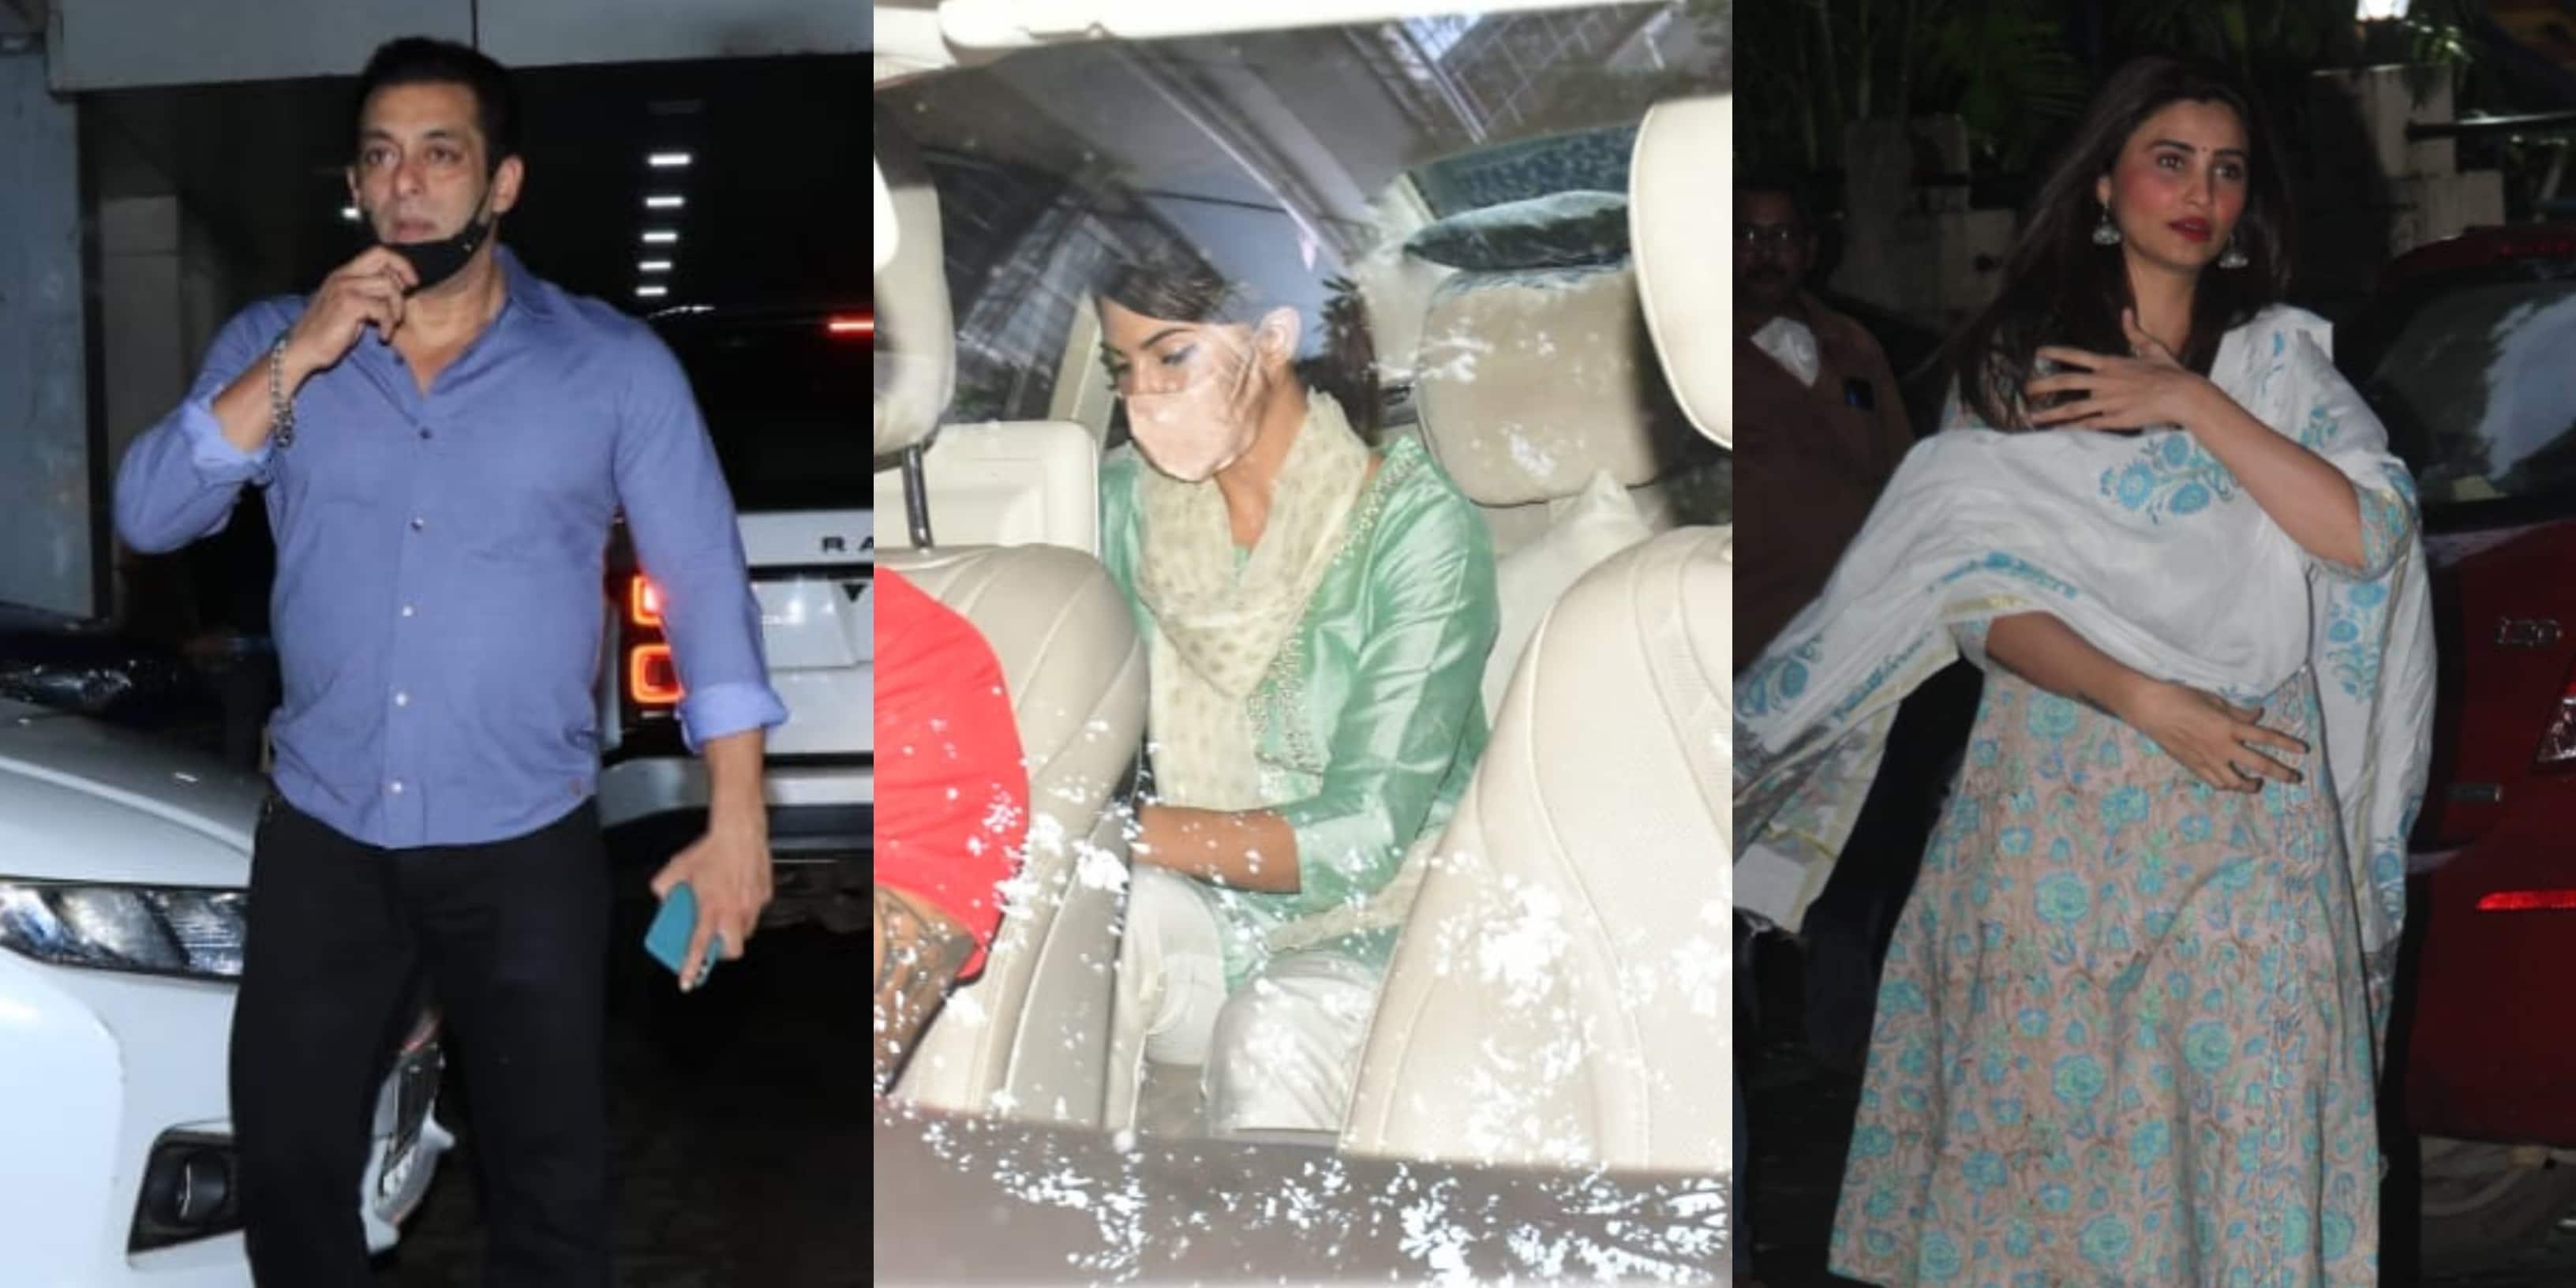 Spotted: Salman Khan, Jacqueline Fernandez, Daisy Shah Arrive For Ganesh Puja At Sohail Khan's House